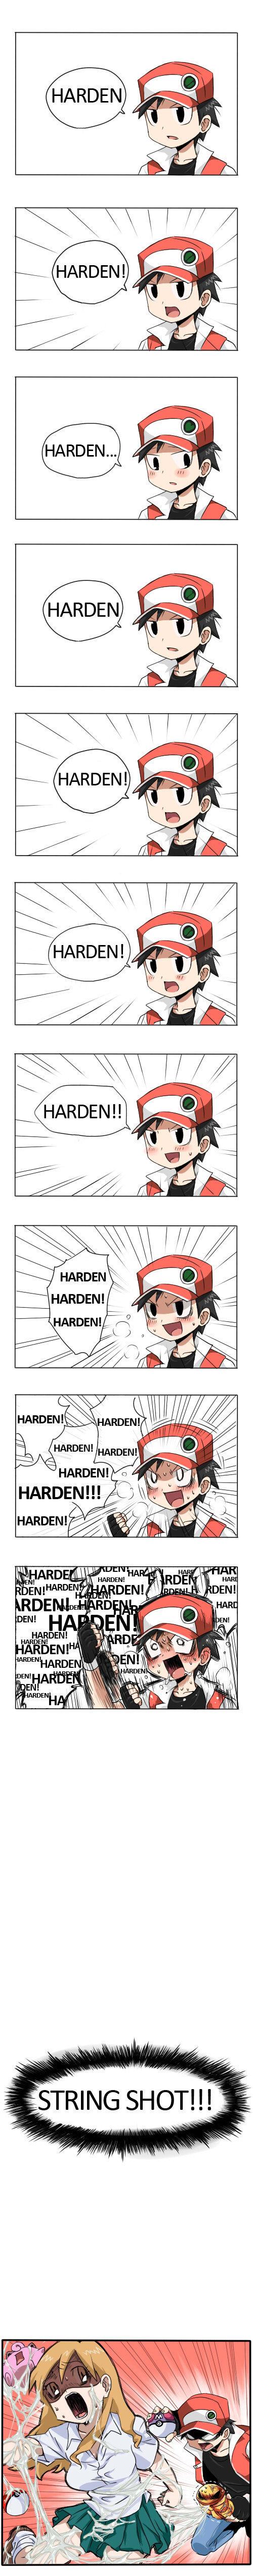 HARDEN. . Rape Pokemon WTF